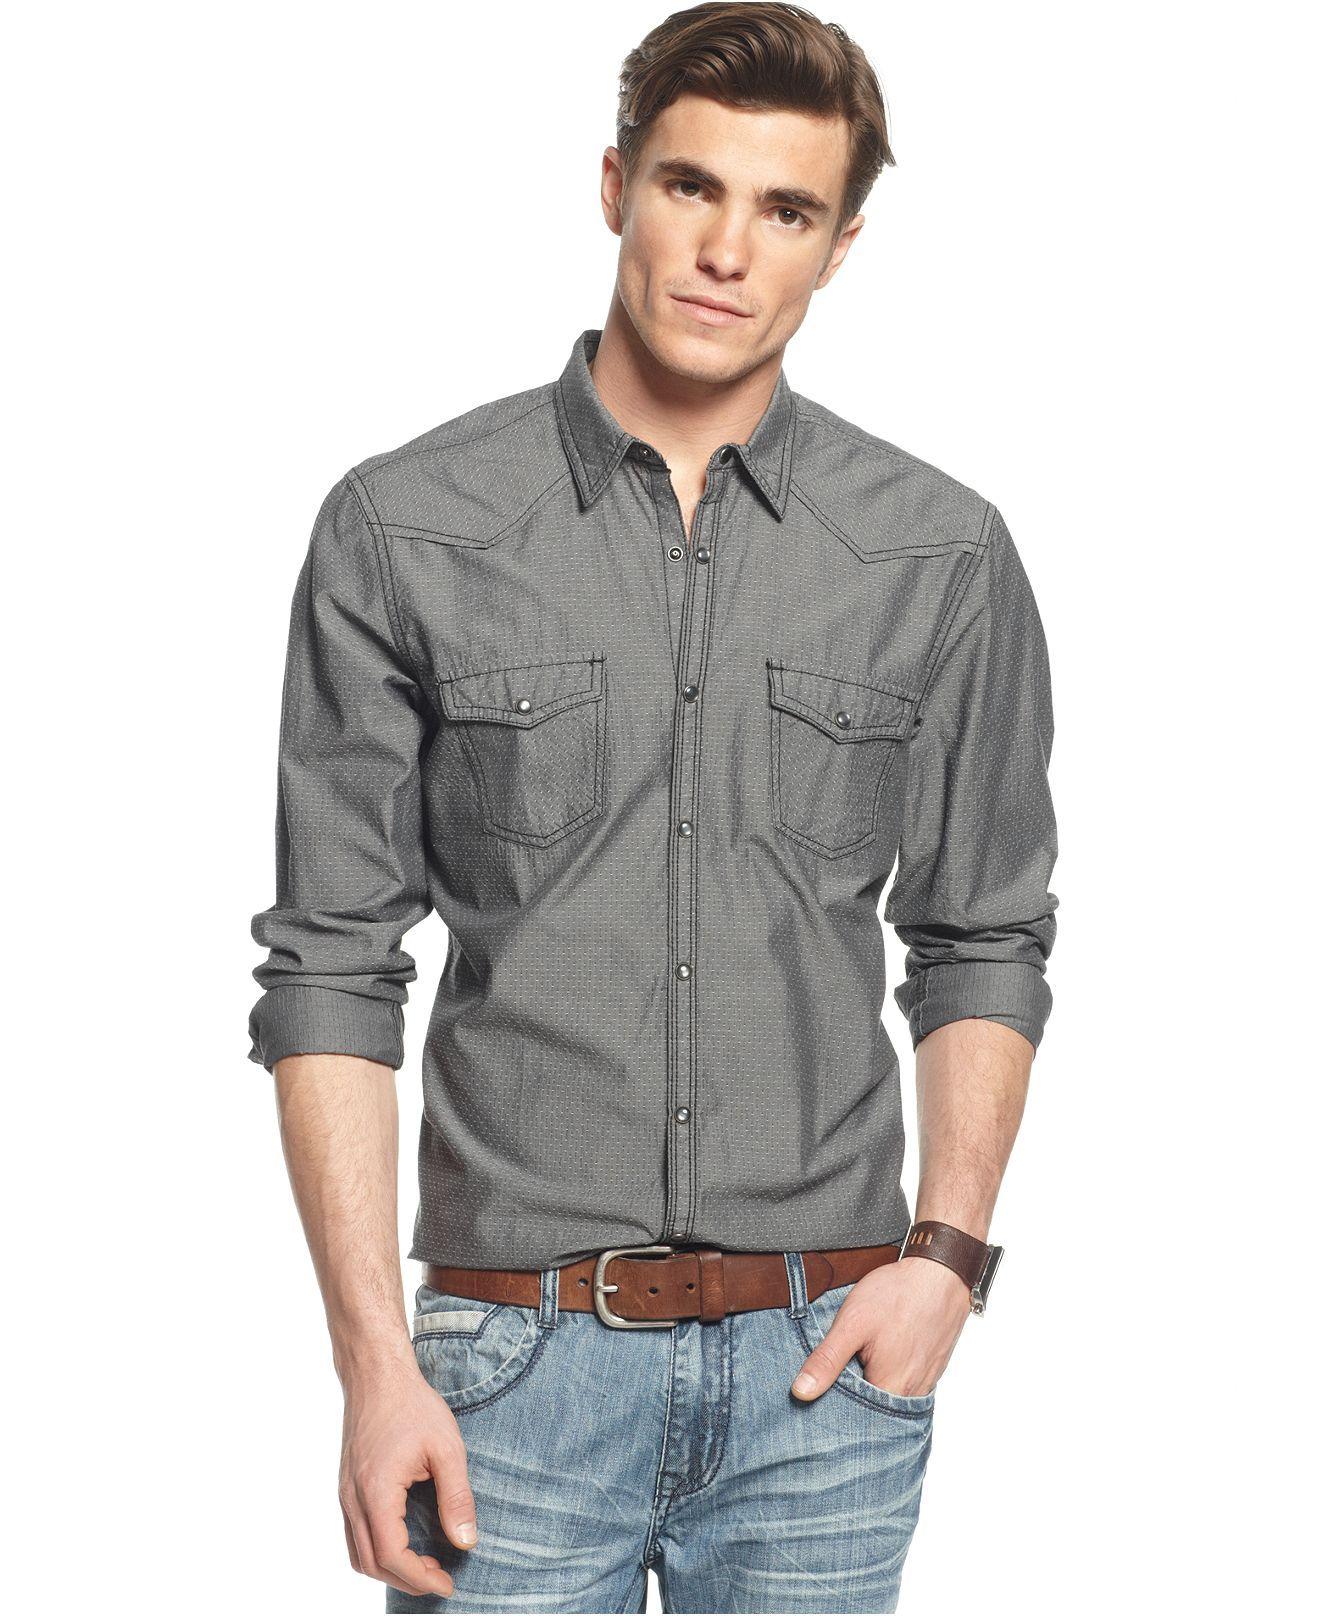 Inc international concepts shirt long sleeve wimbley